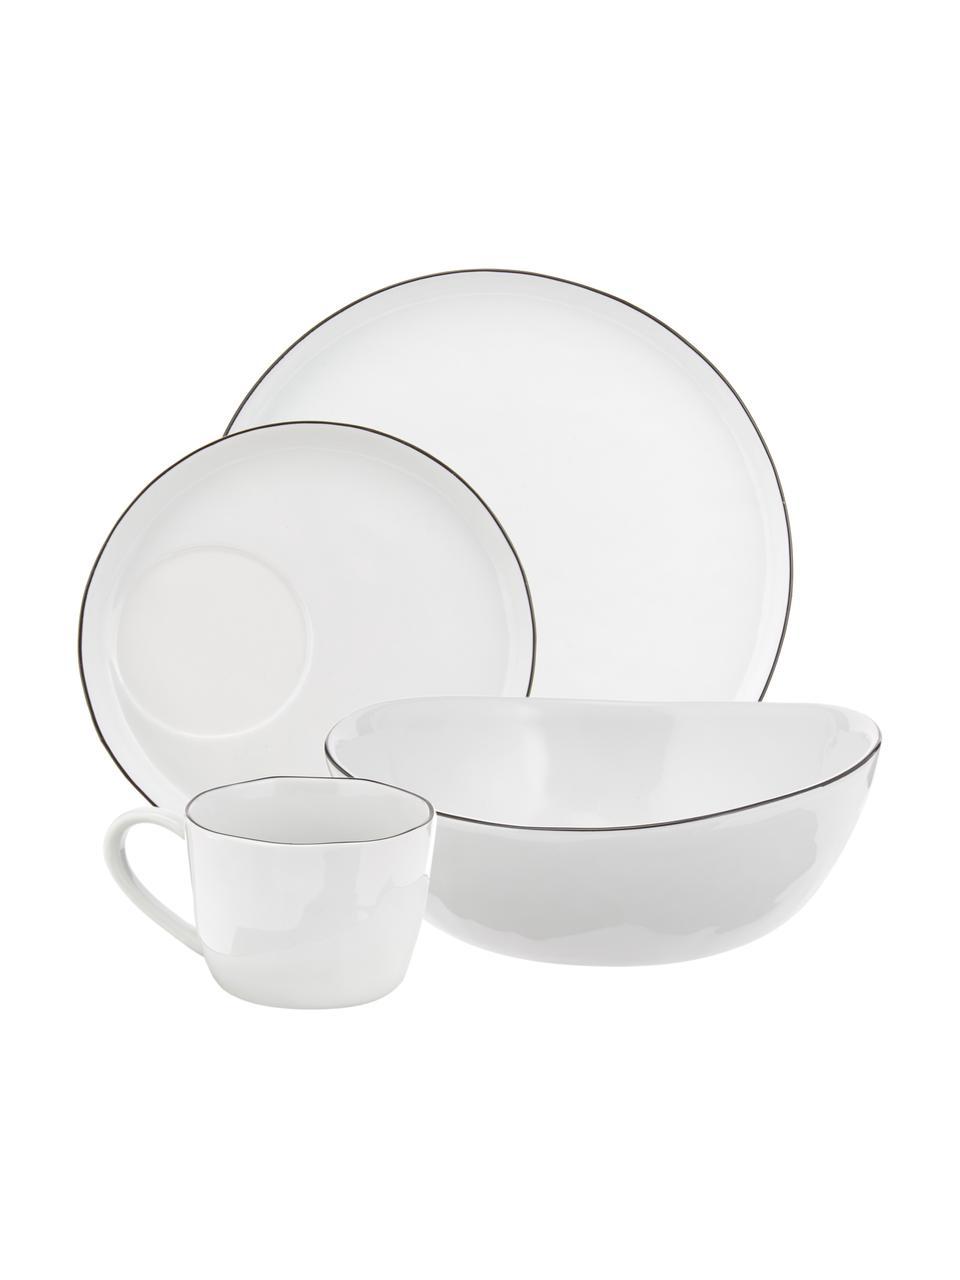 Set de desayuno artesanal Salt, 4comensales (16pzas.), Porcelana, Blanco crudo, negro, Set de diferentes tamaños